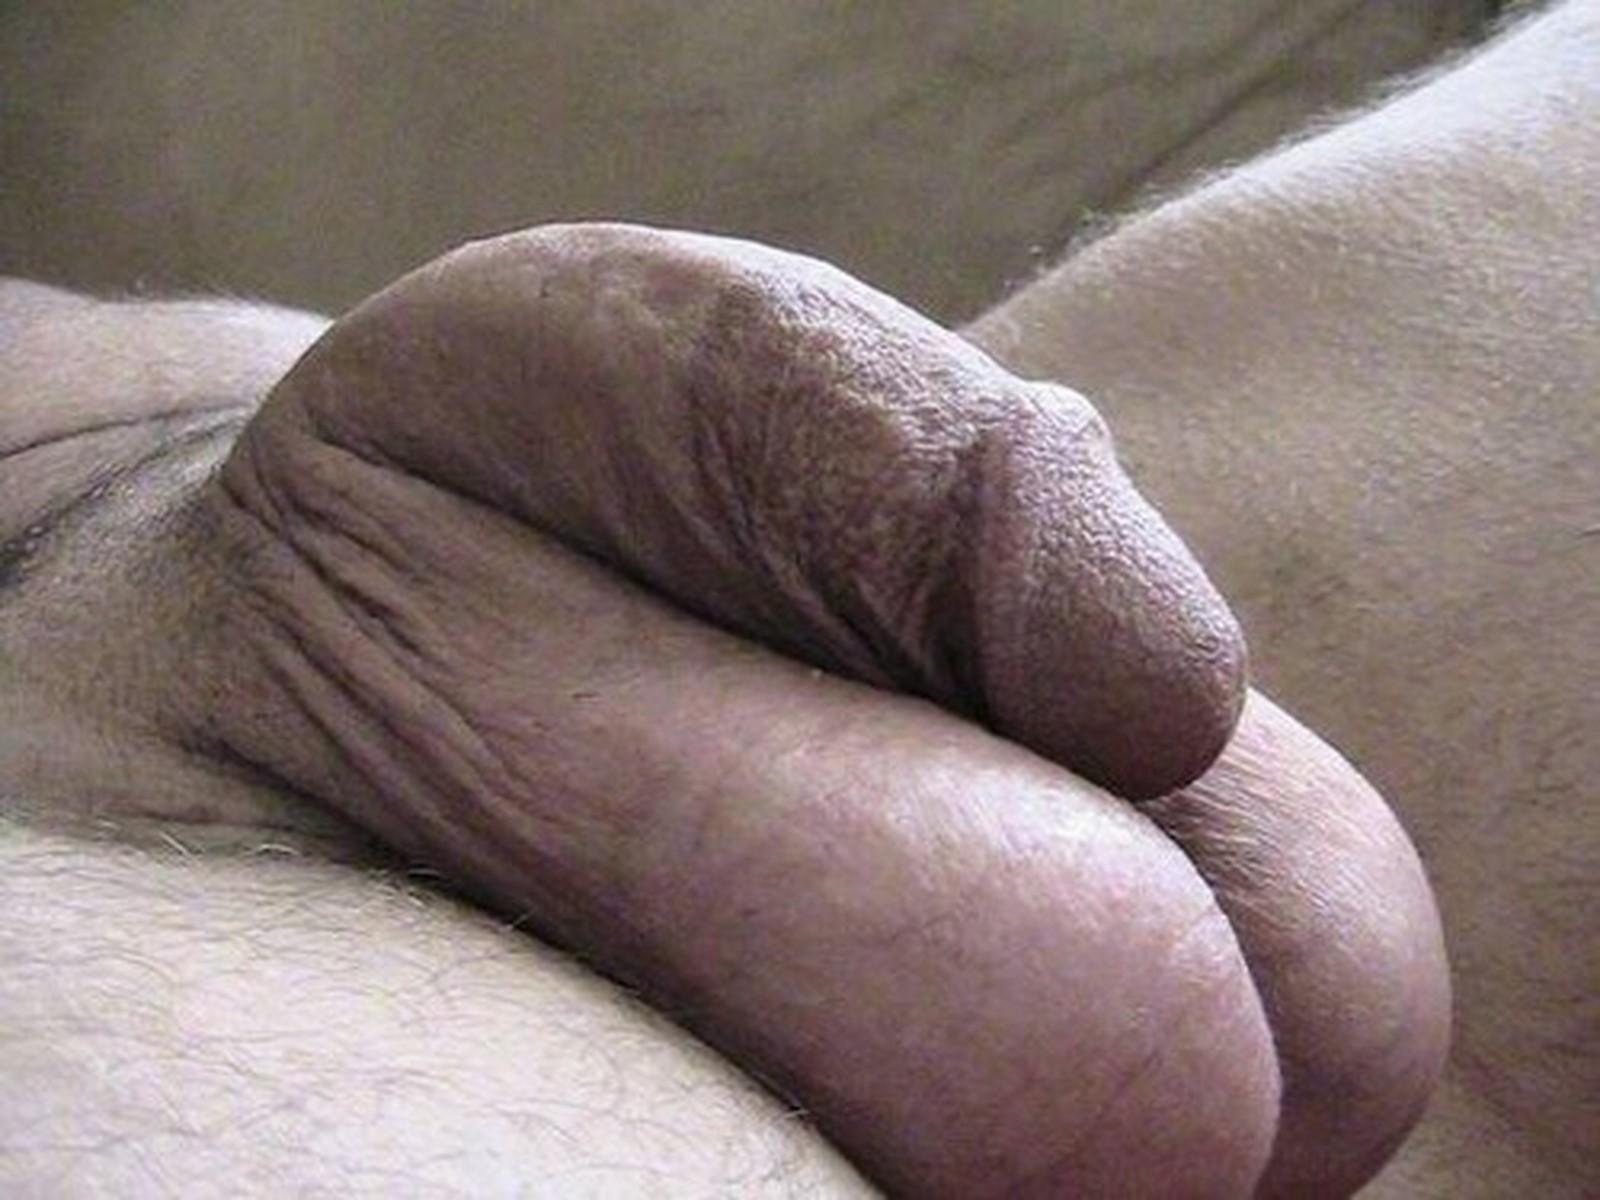 Ebony male cock balls pictures sex